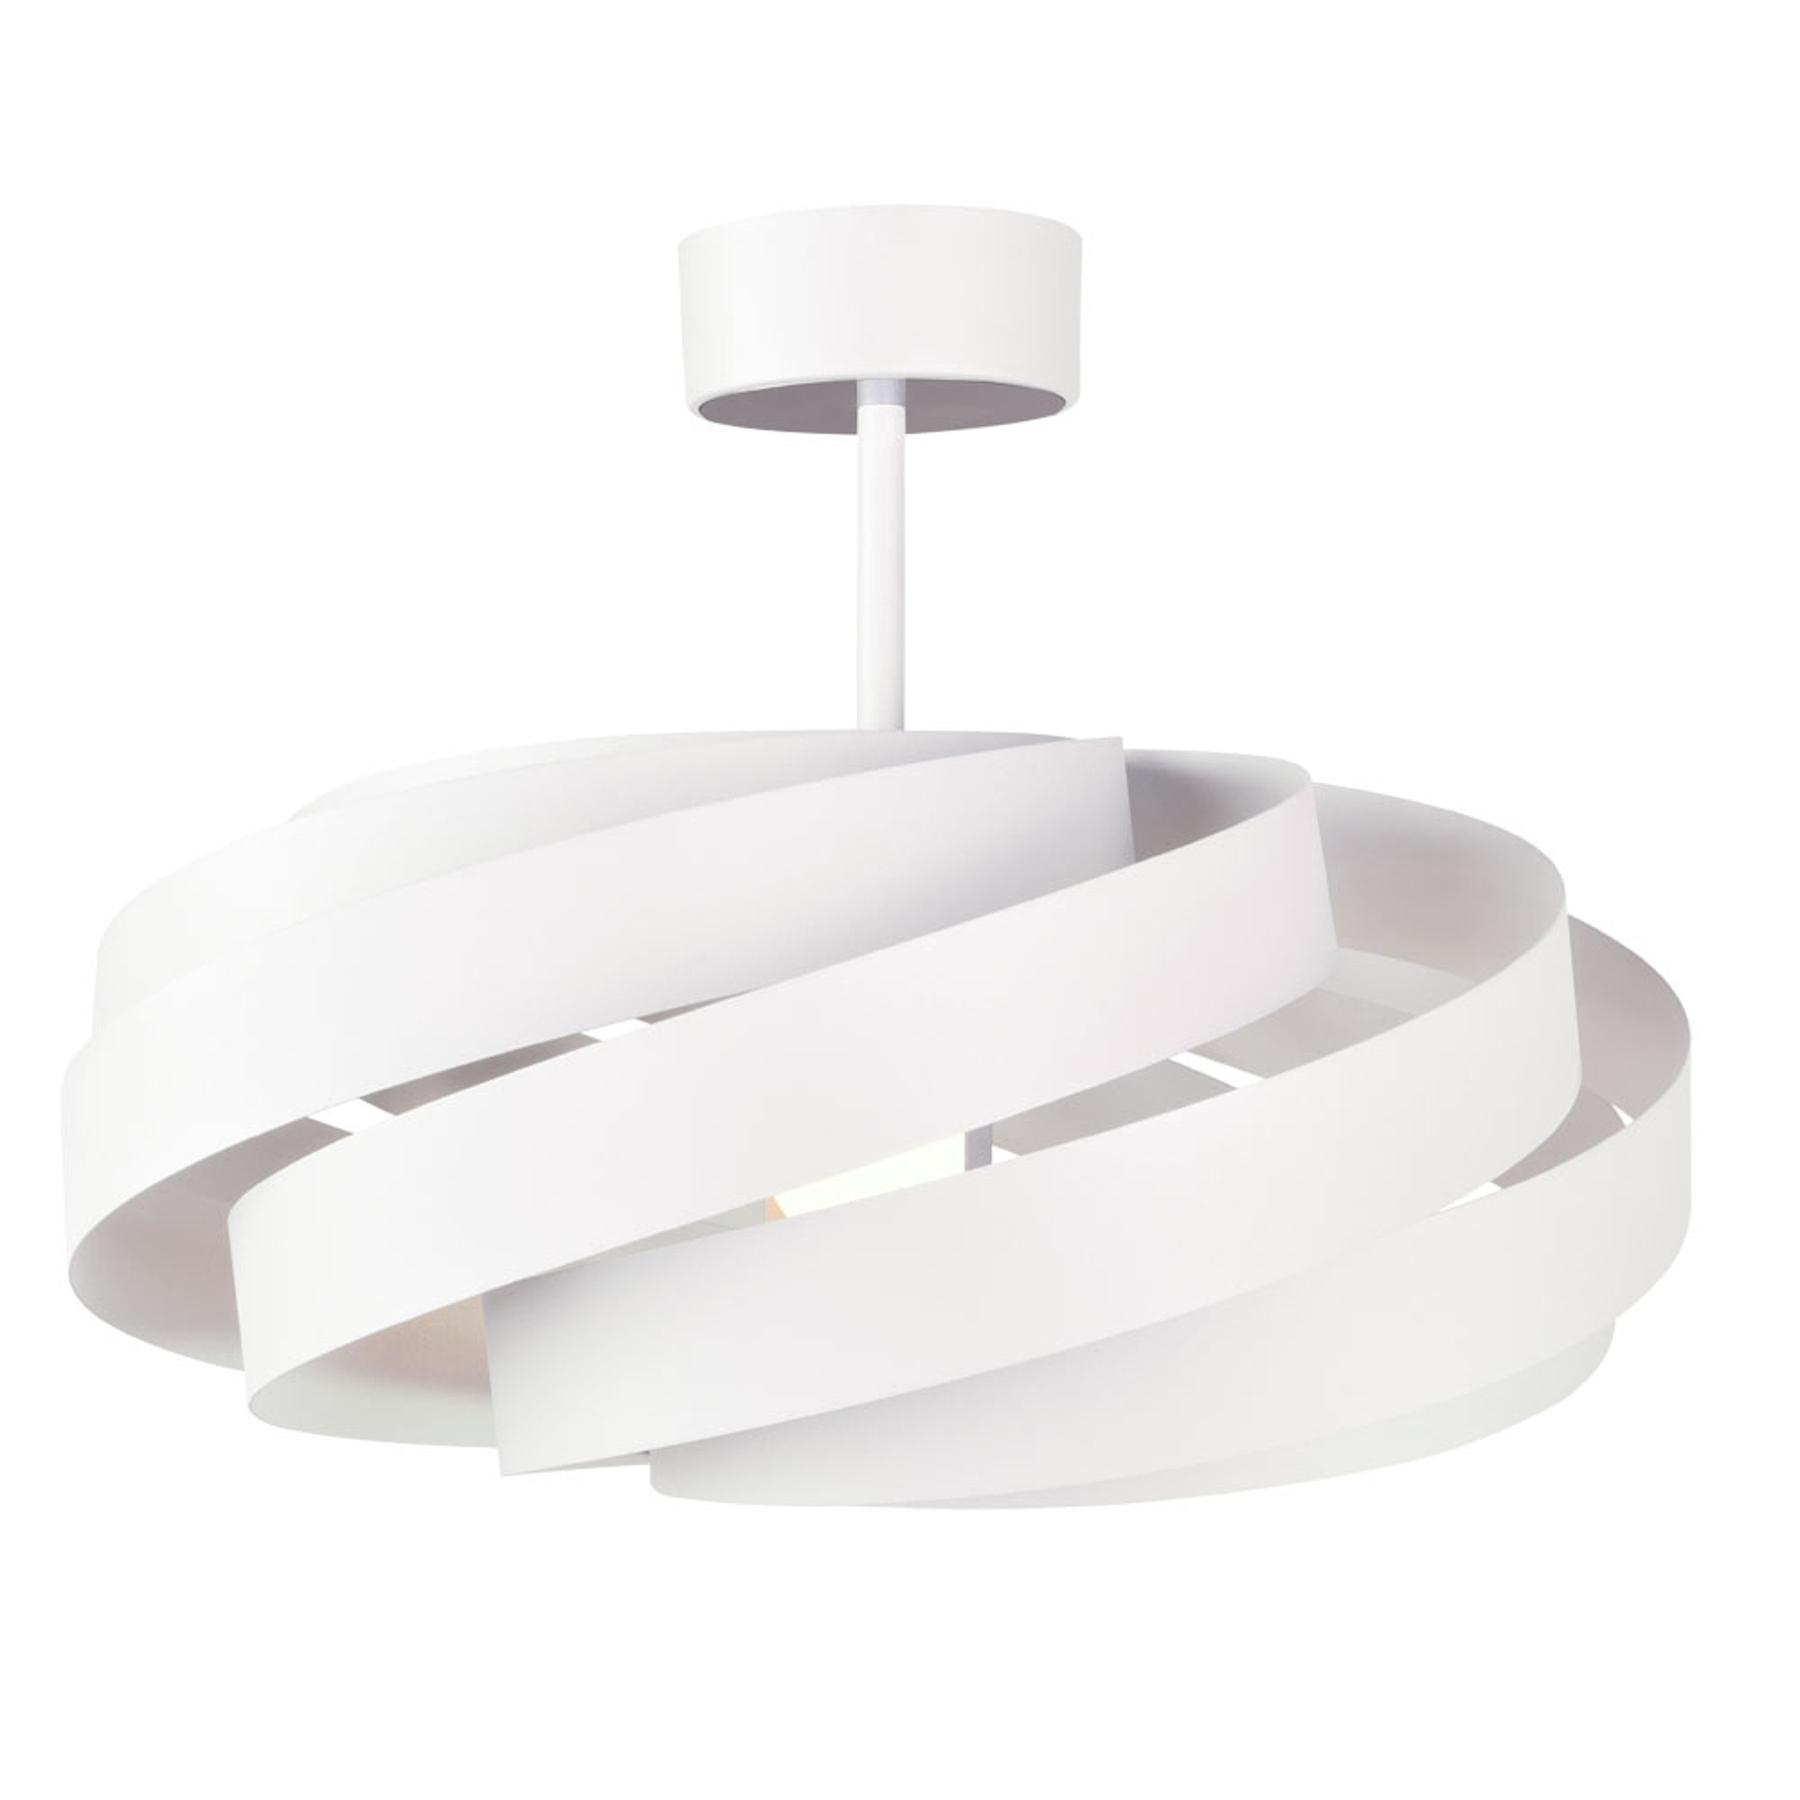 Lampa sufitowa Vento, biała Ø 50cm